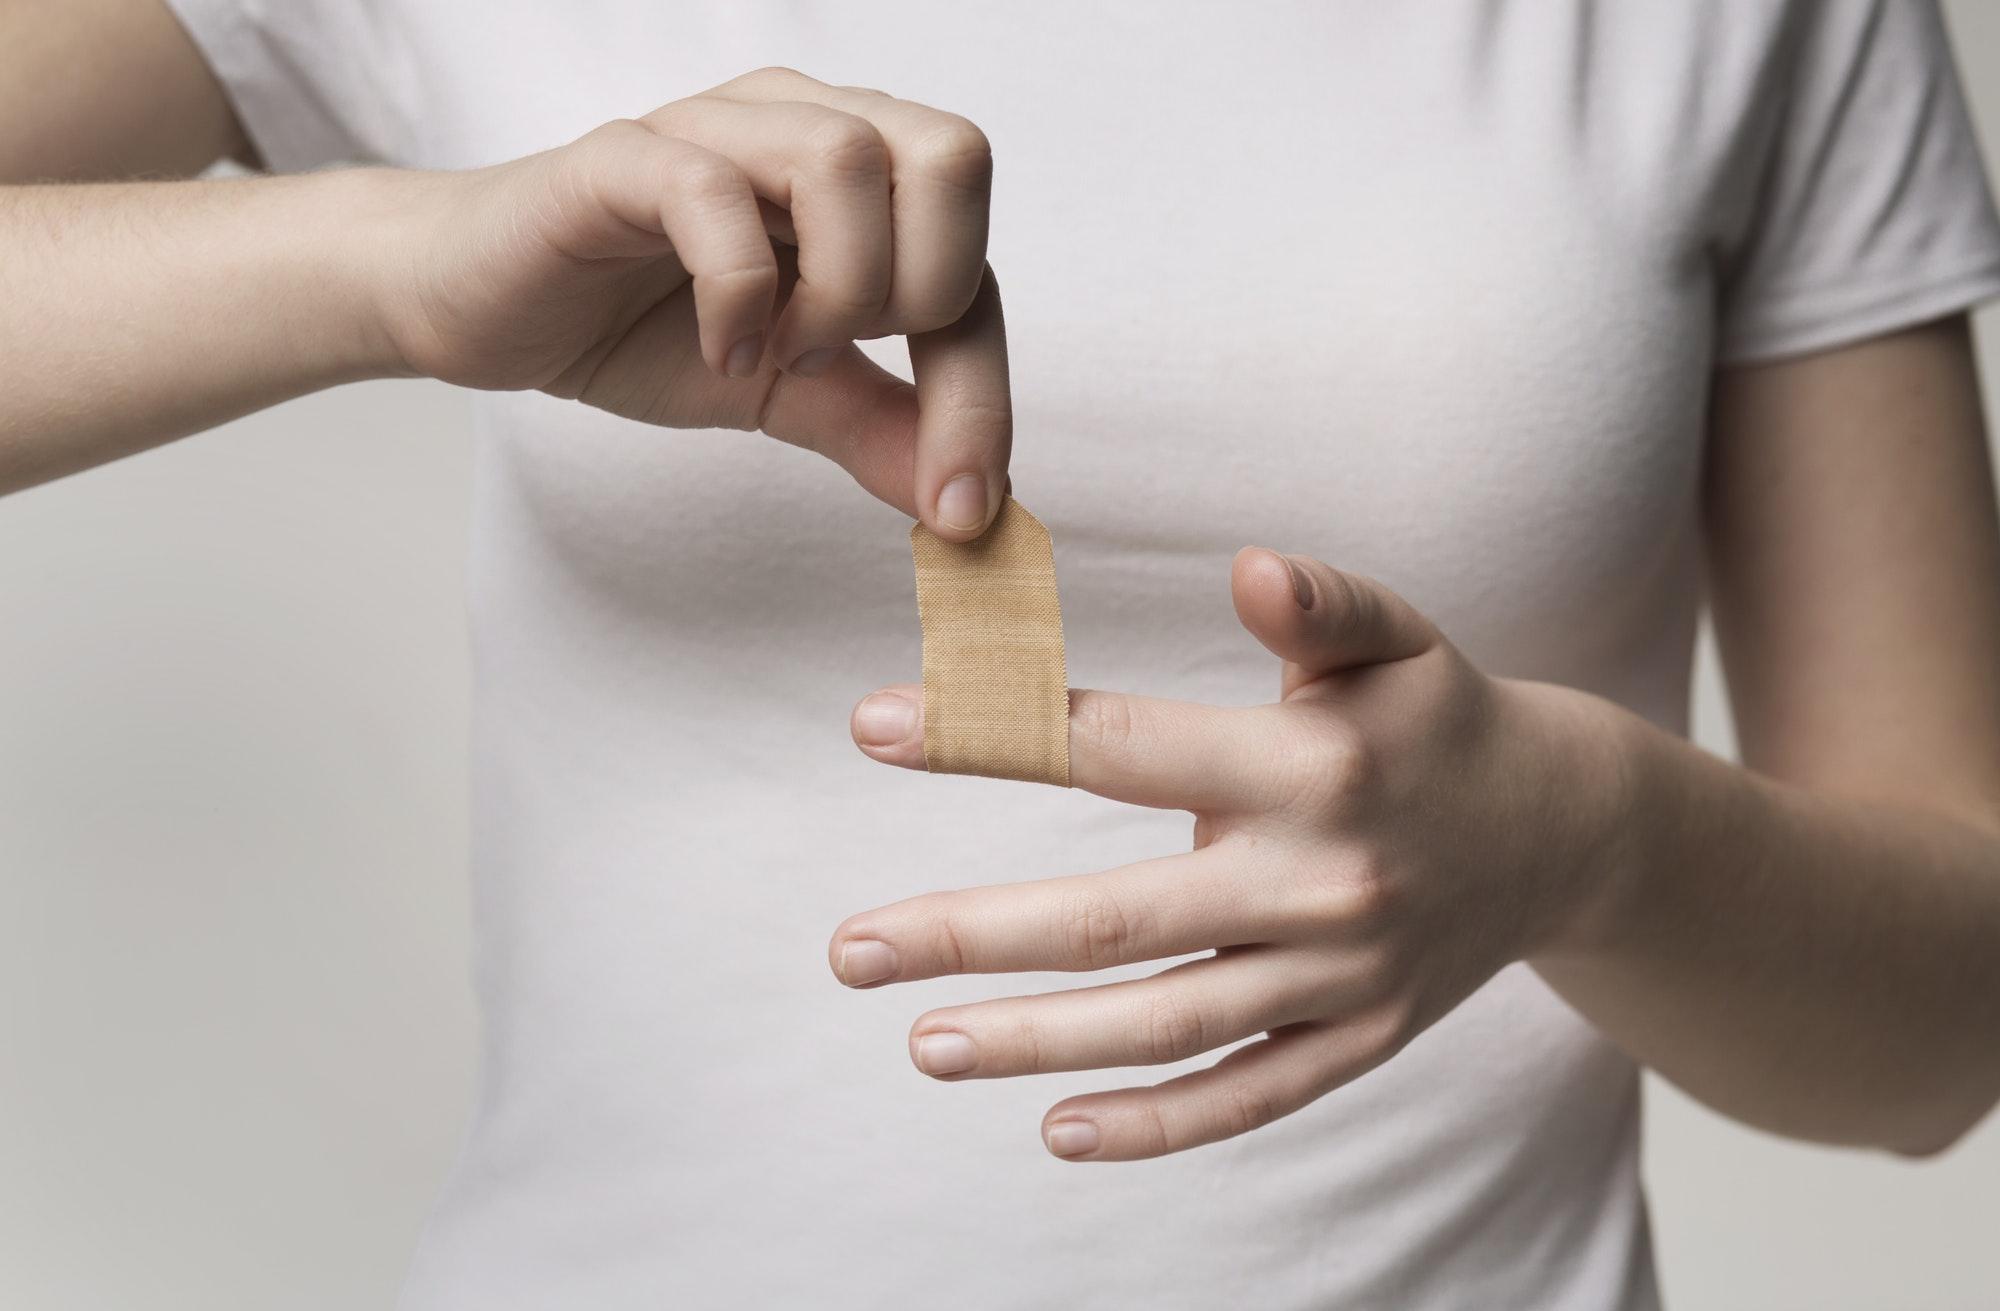 Woman using adhesive tape on injured finger